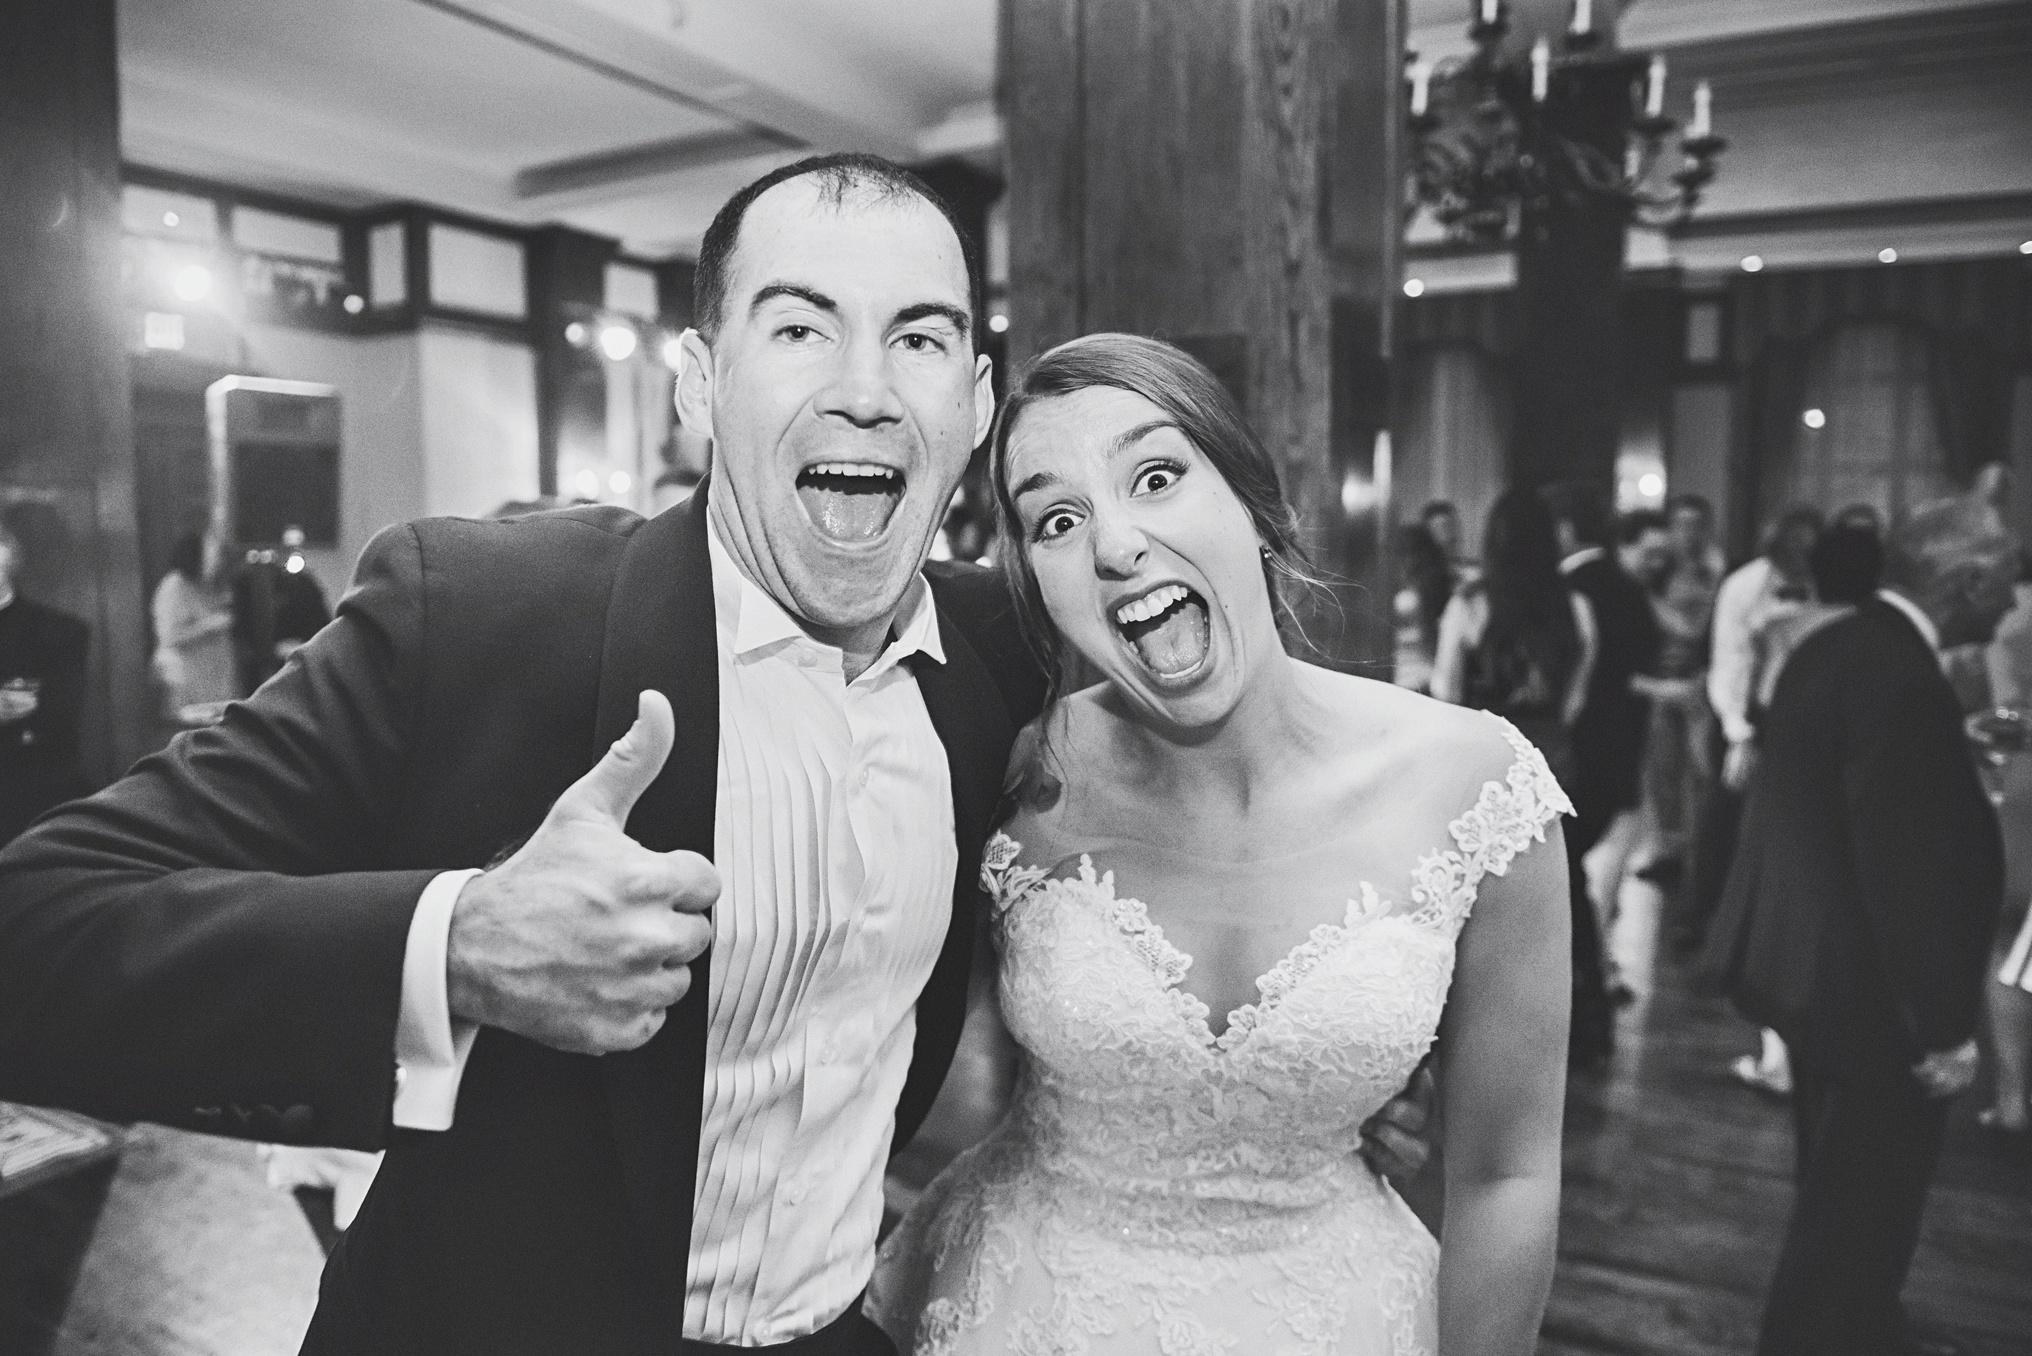 best_wedding_photography_2017_by_lucas_botz_photography_168.jpg